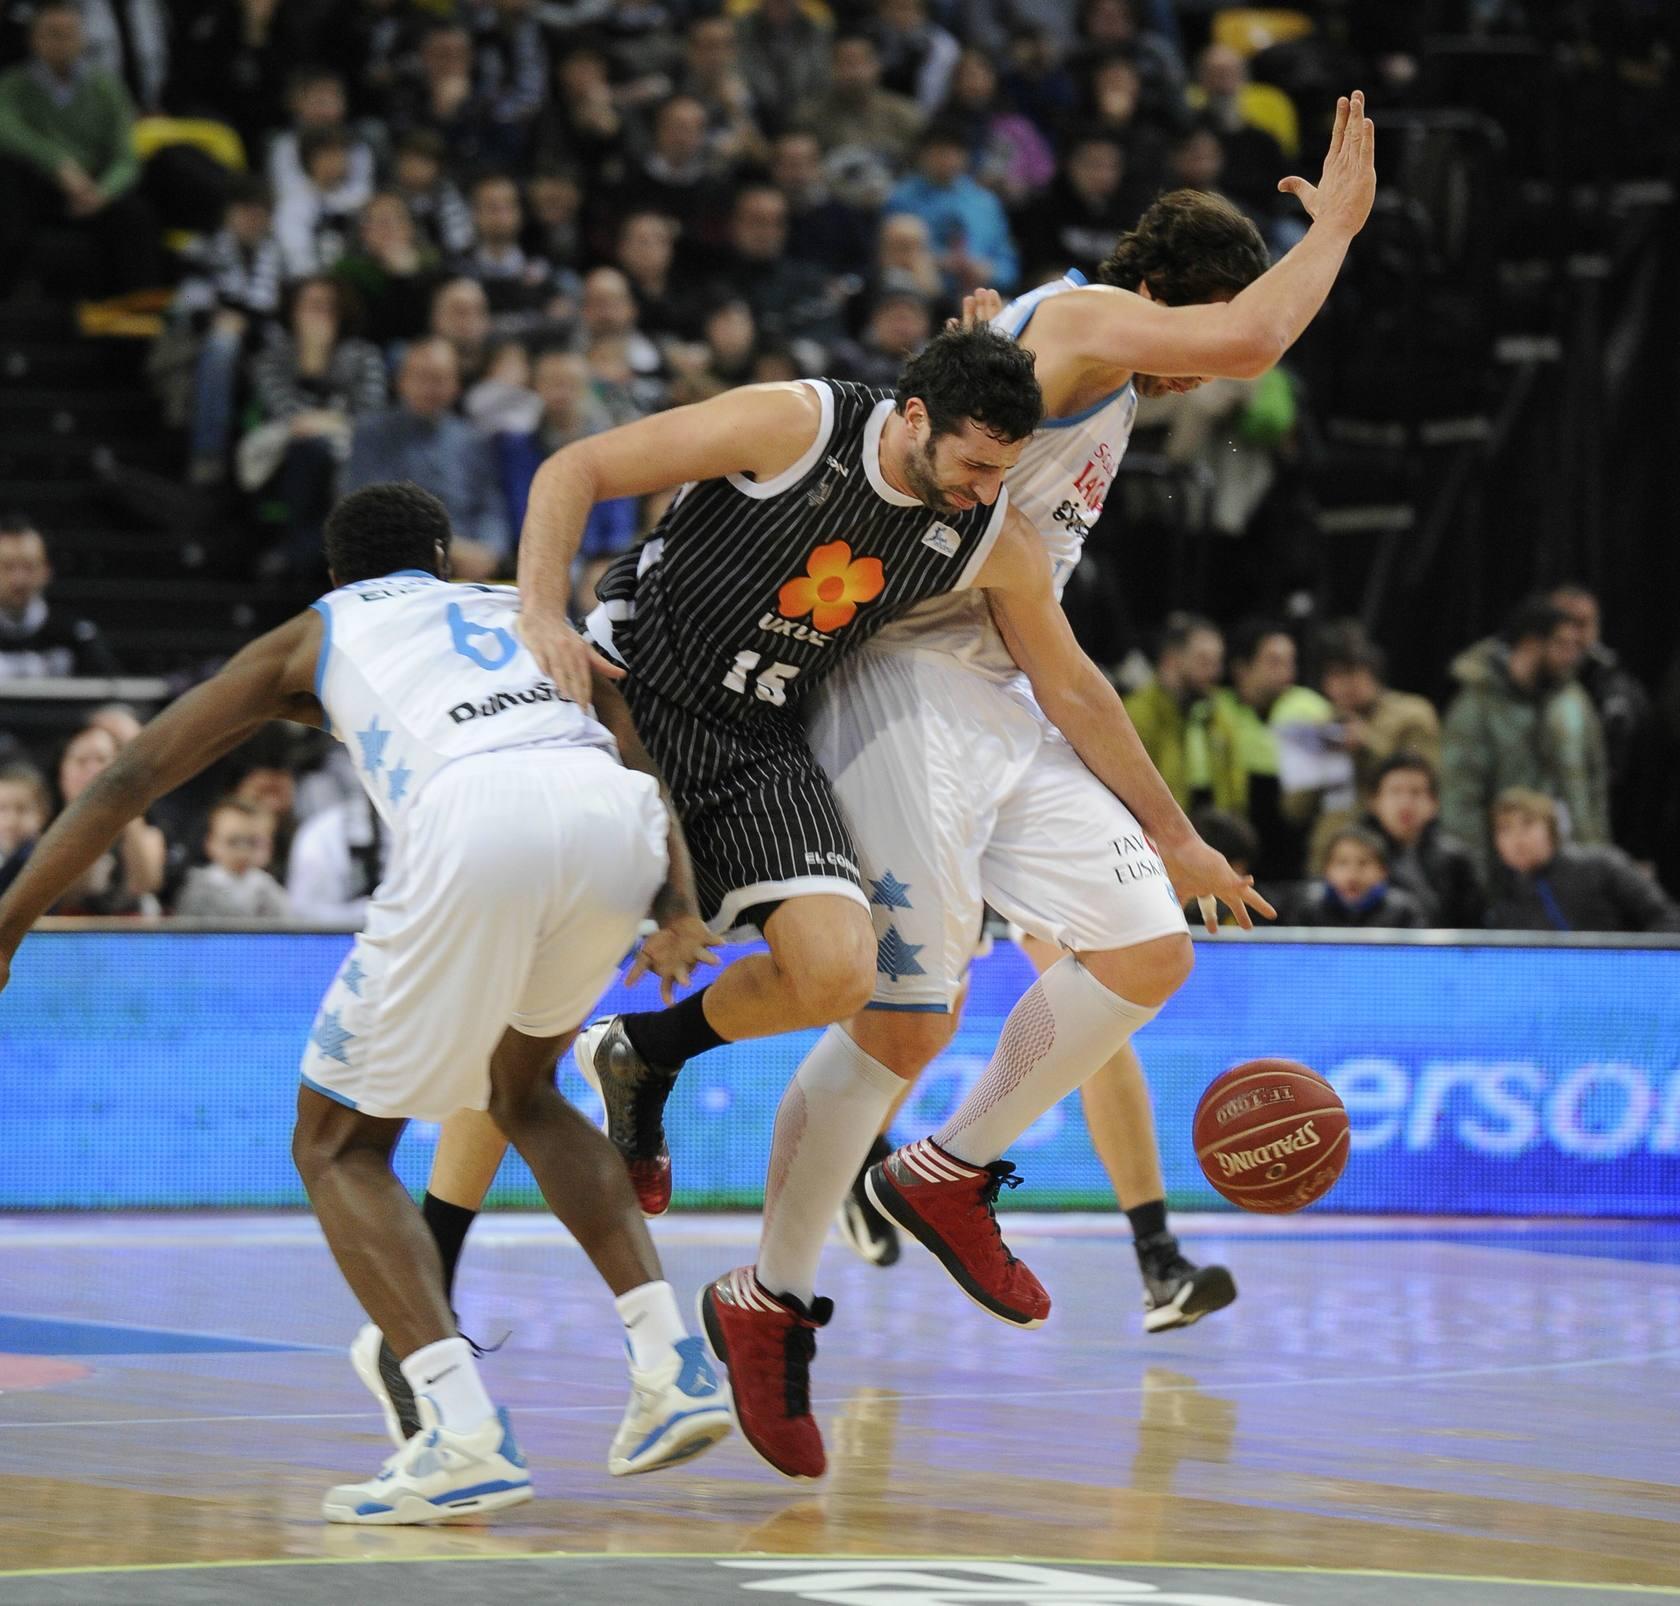 Bilbao Basket-Lagun Aro, en imágenes